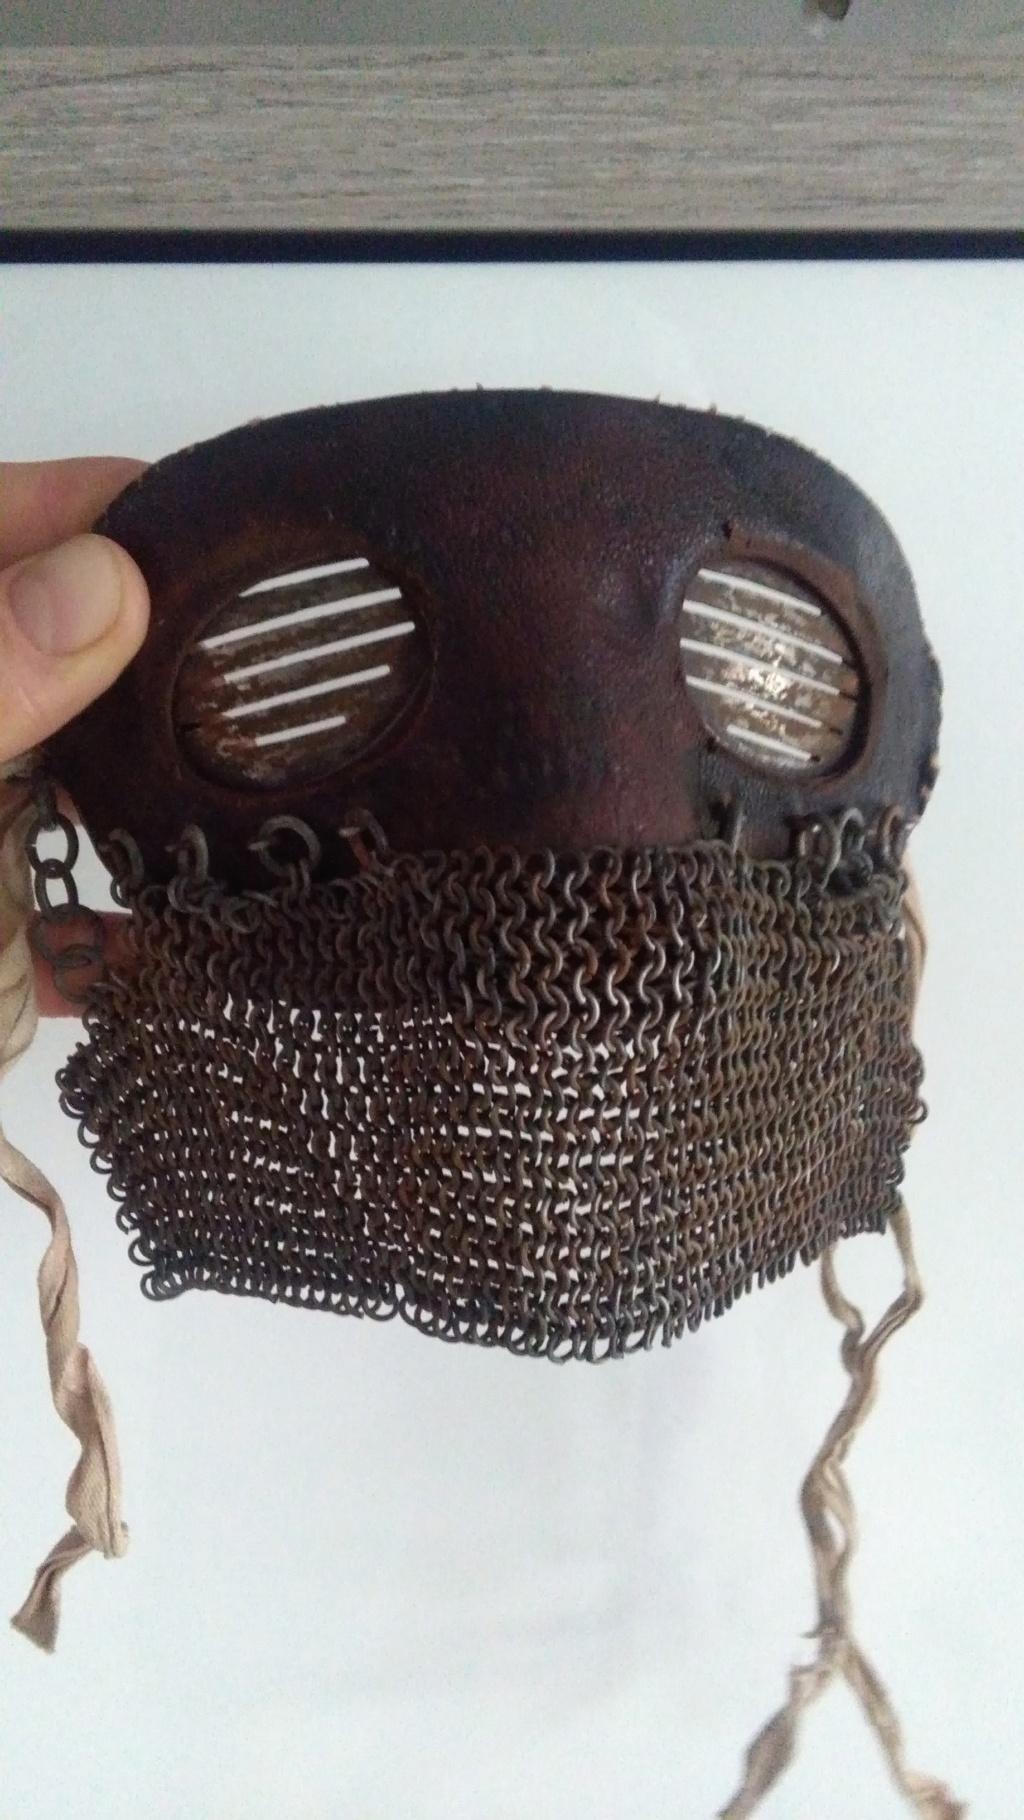 Masque de tankiste 1917 - 1918 Img_2071